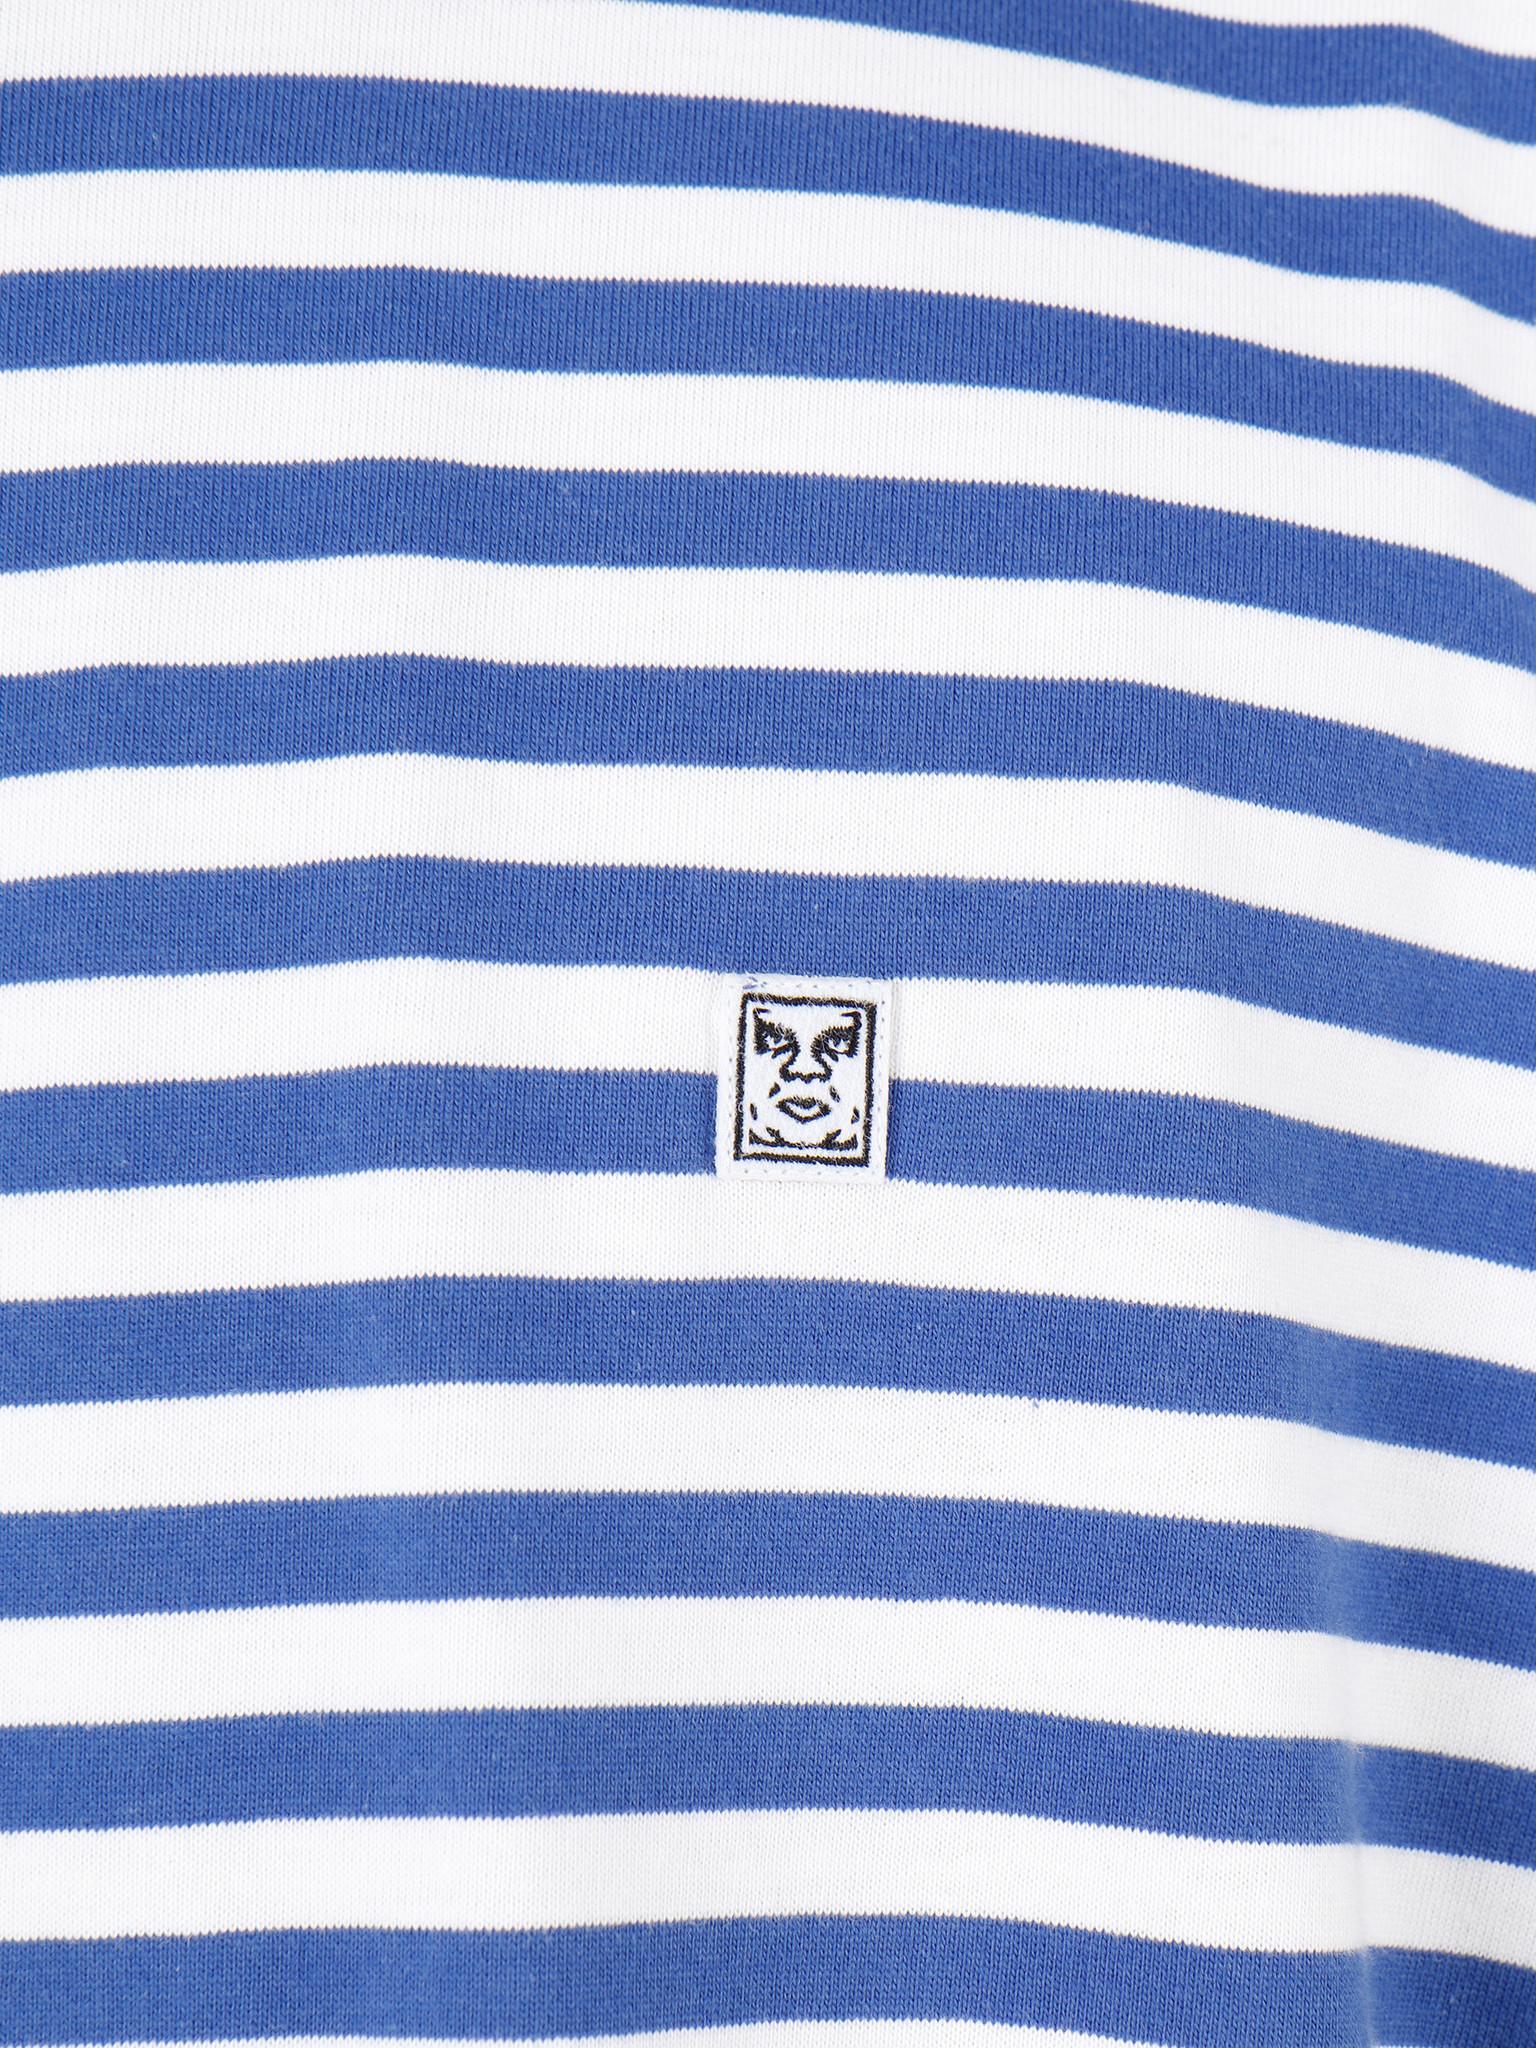 Obey Obey 89 Icon Stripe Box Tee II Shortsleeve Blue Multi 131080242-BMU